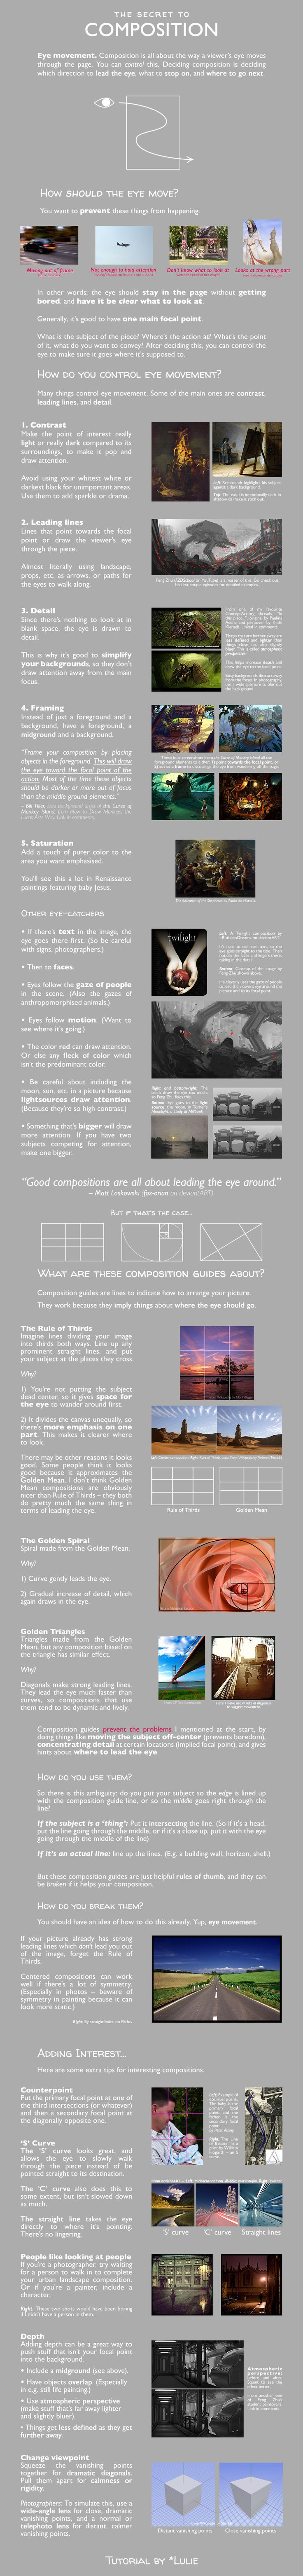 The Secret to Composition by Lulie.deviantart.com on @deviantART